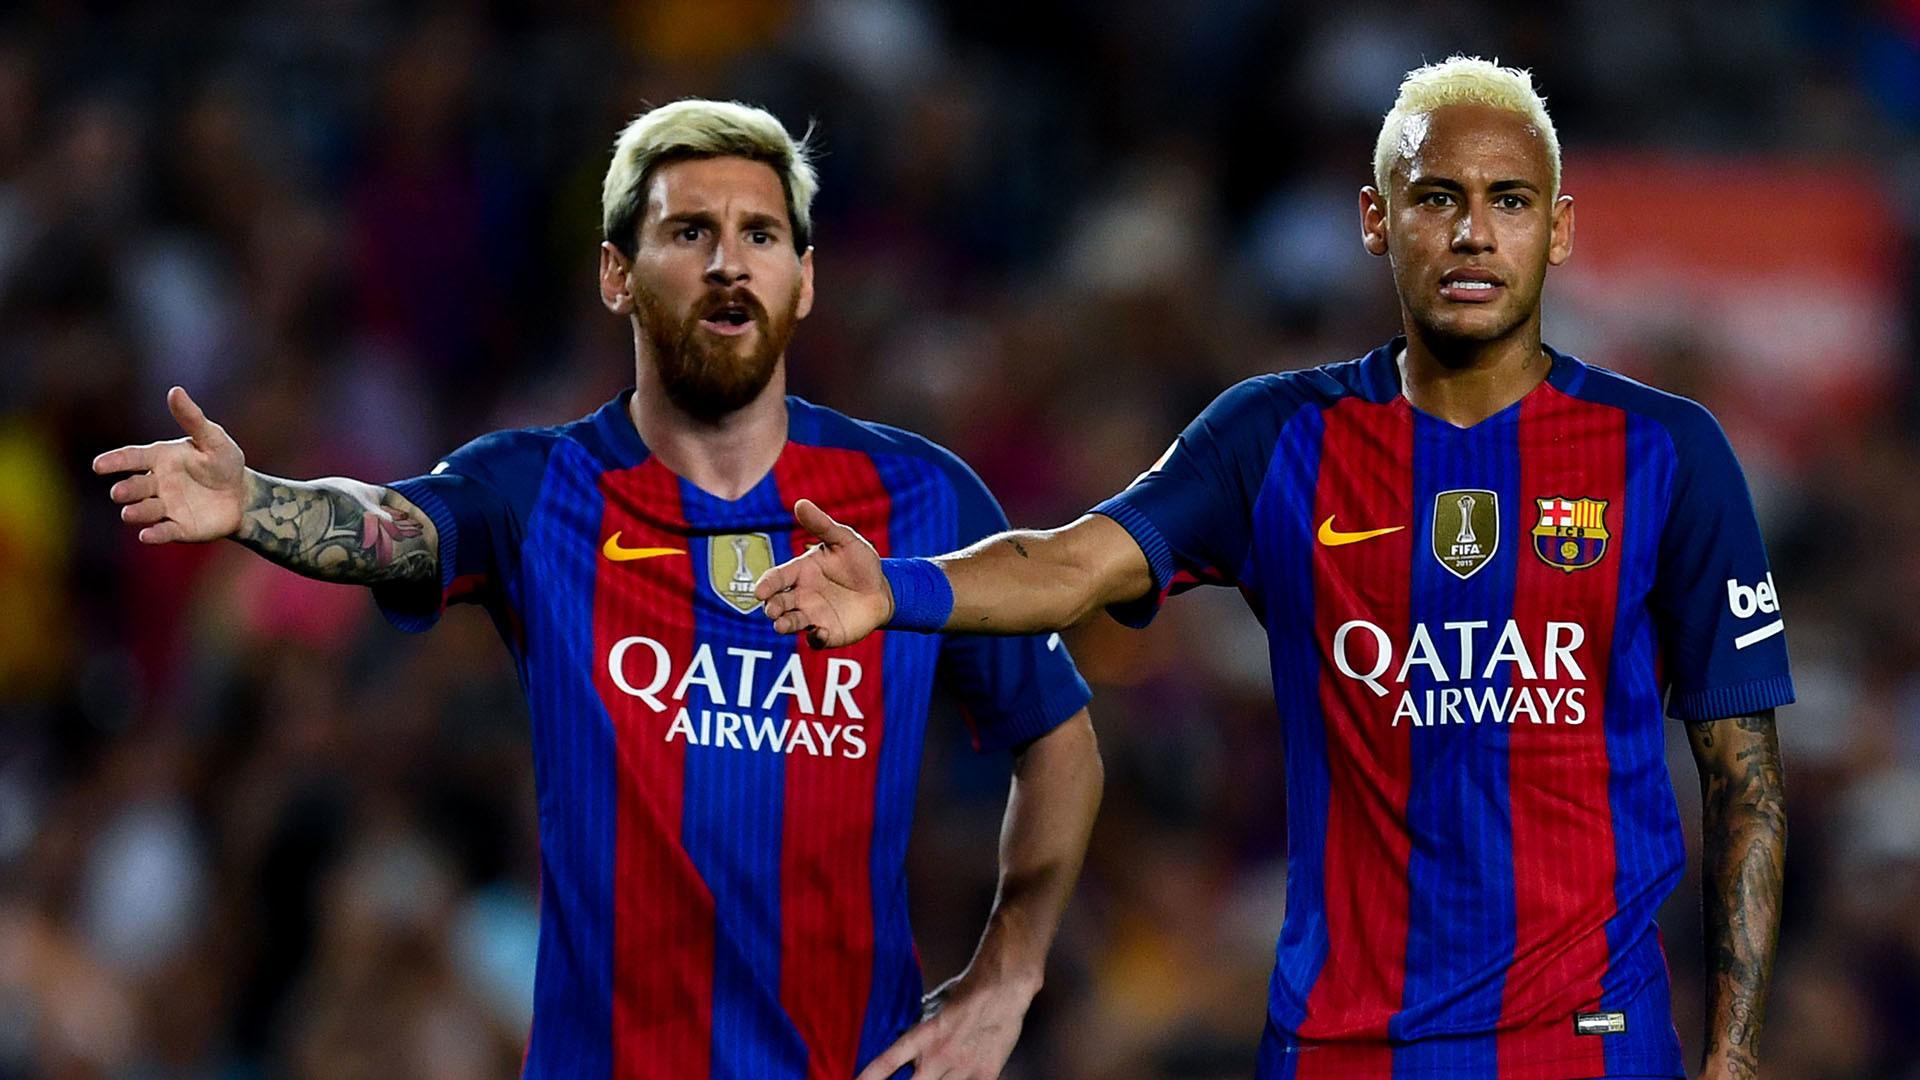 Gunning for FIFA Best winner Ronaldo: Messi and Aubameyang ahead as 2017  race begins – Goal.com